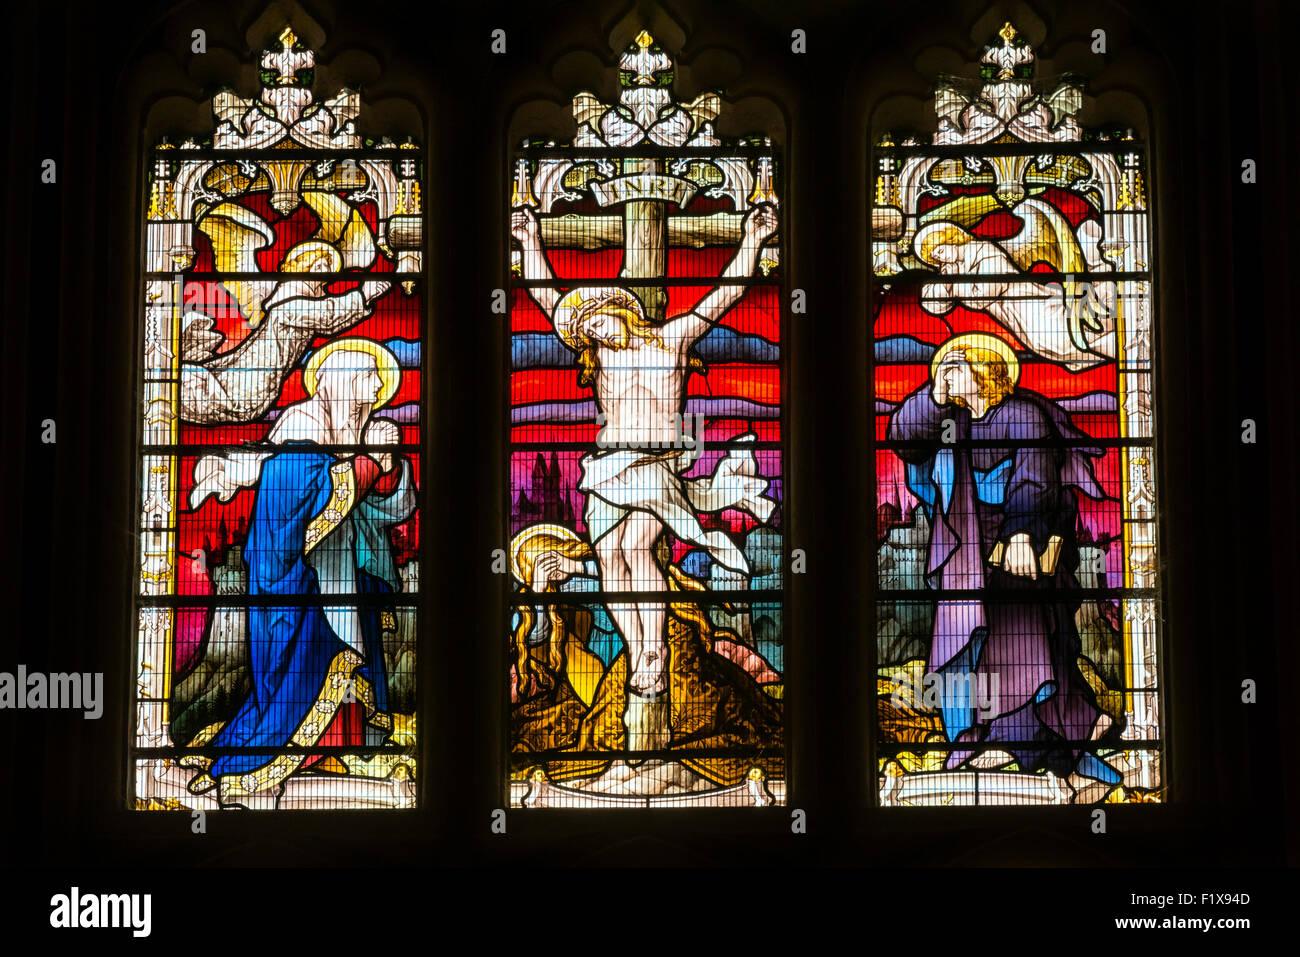 Tewkesbury Abbey kirchliche Glasmalerei, UK. Stockbild